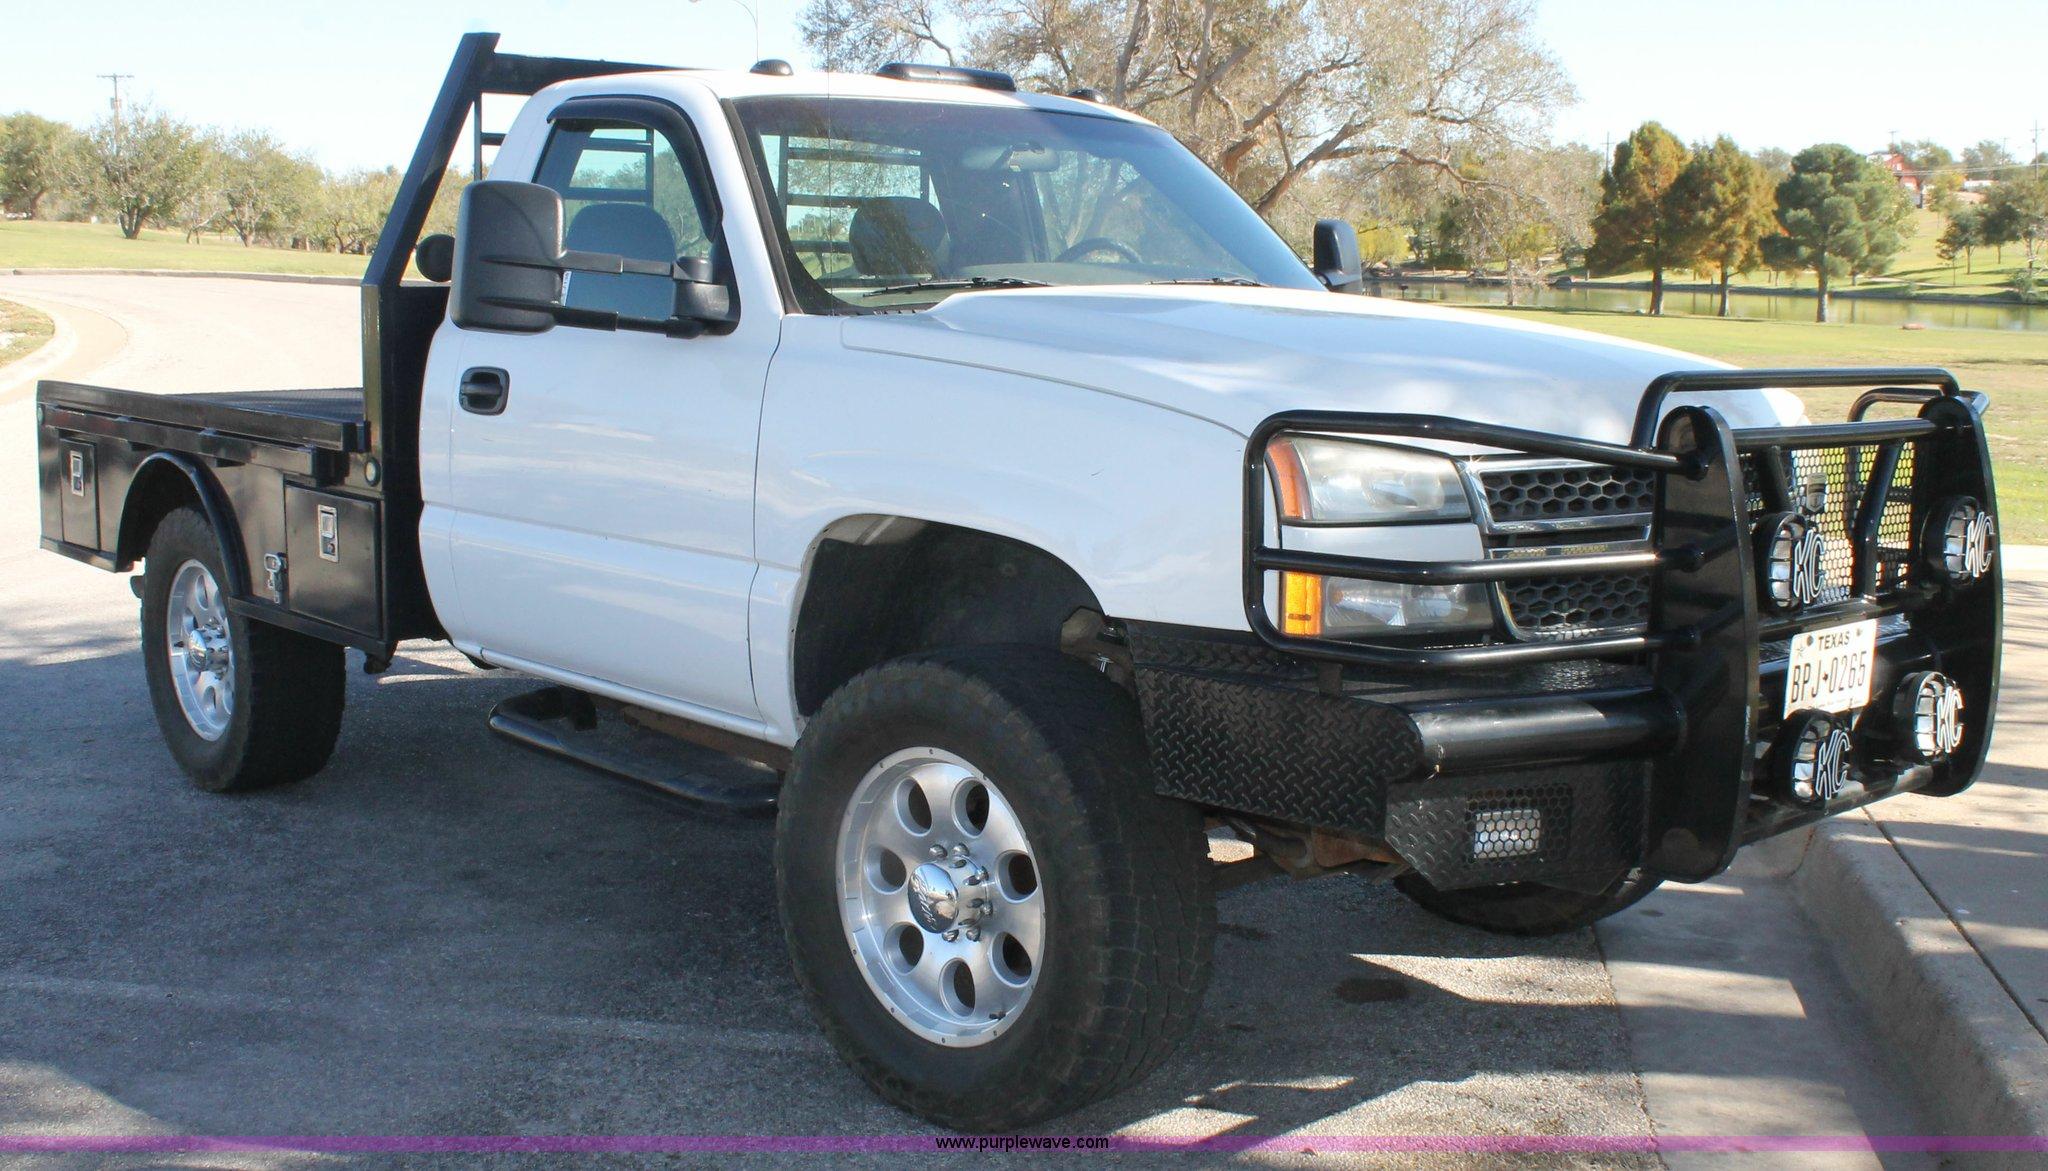 2005 Chevrolet Silverado 2500HD flatbed pickup truck